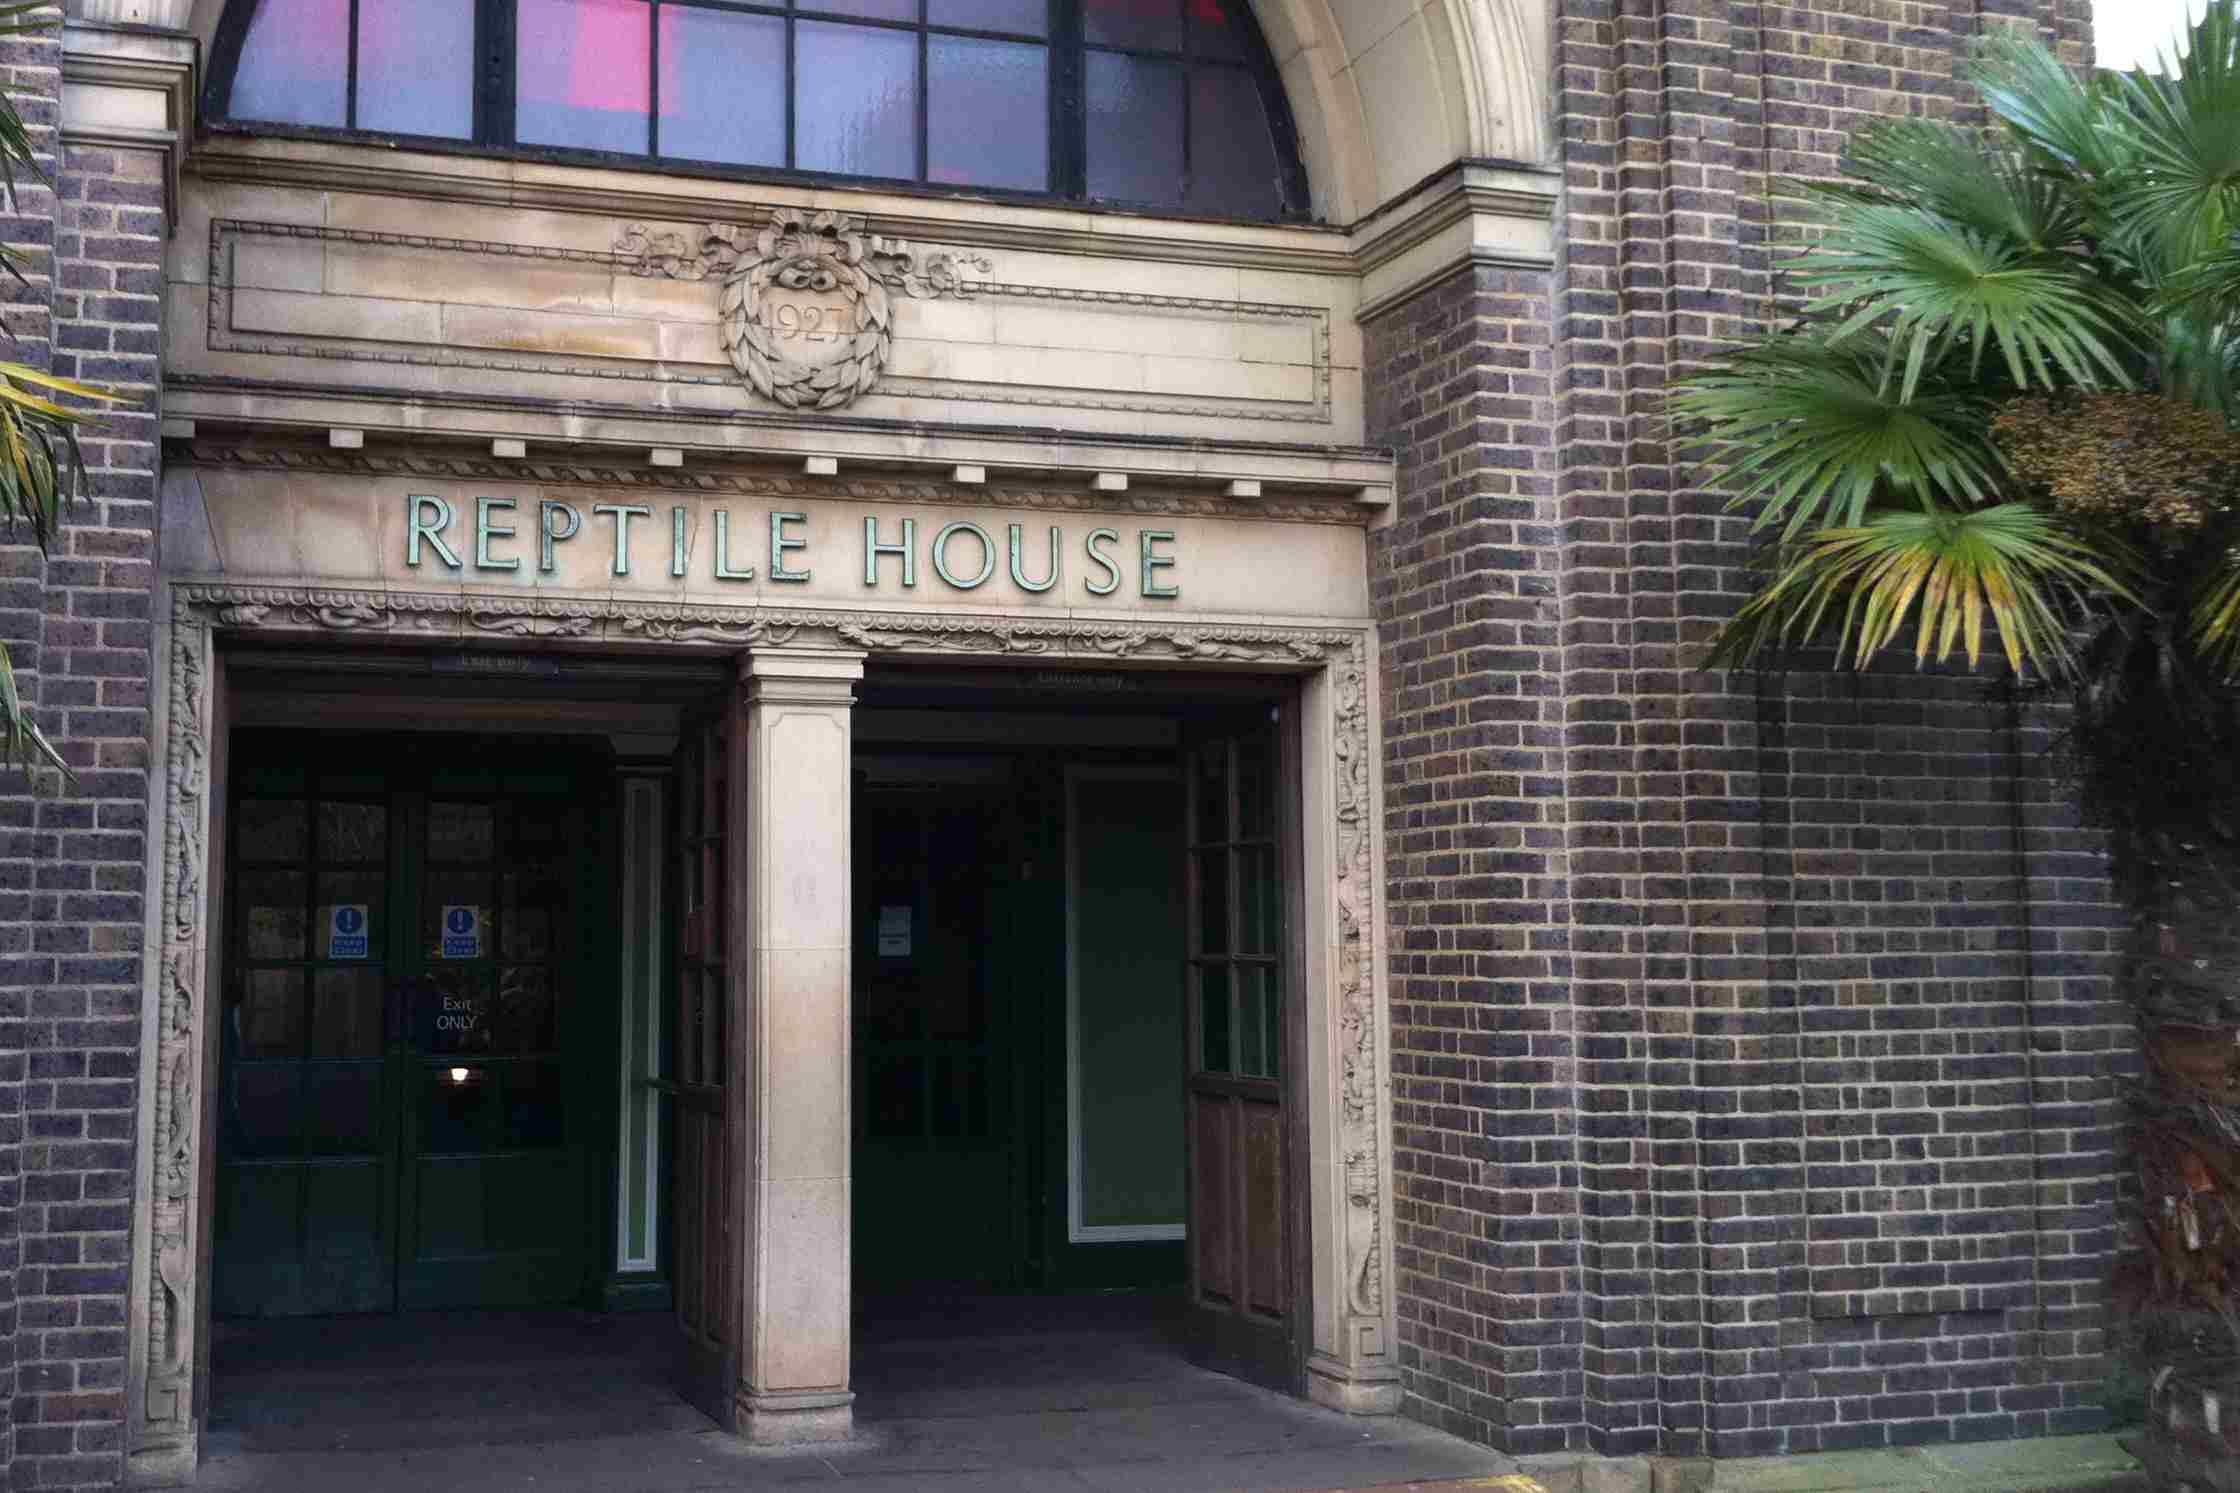 Reptile House London Zoo